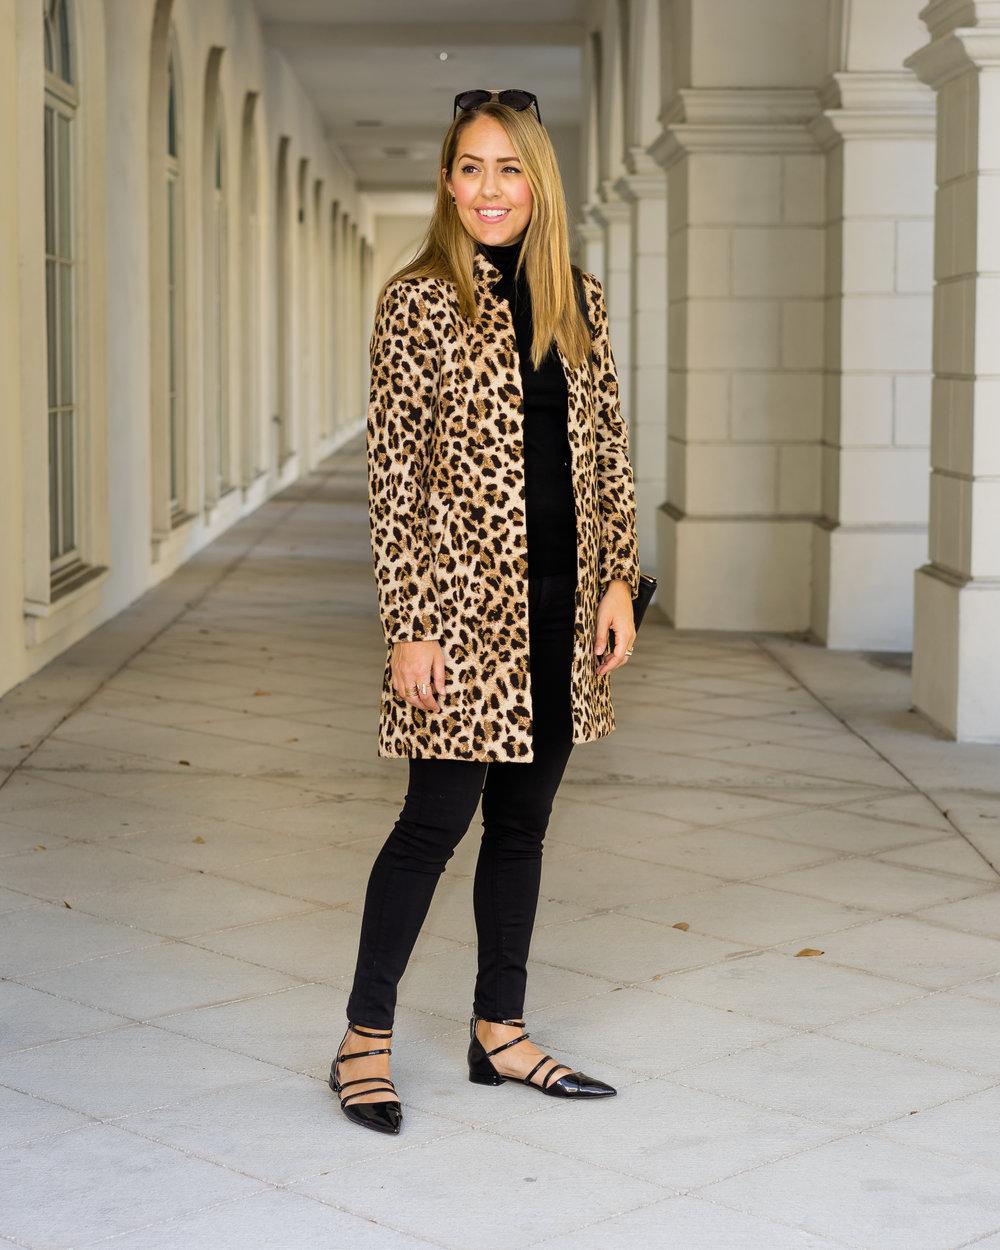 Leopard coat, black turtleneck, black flats